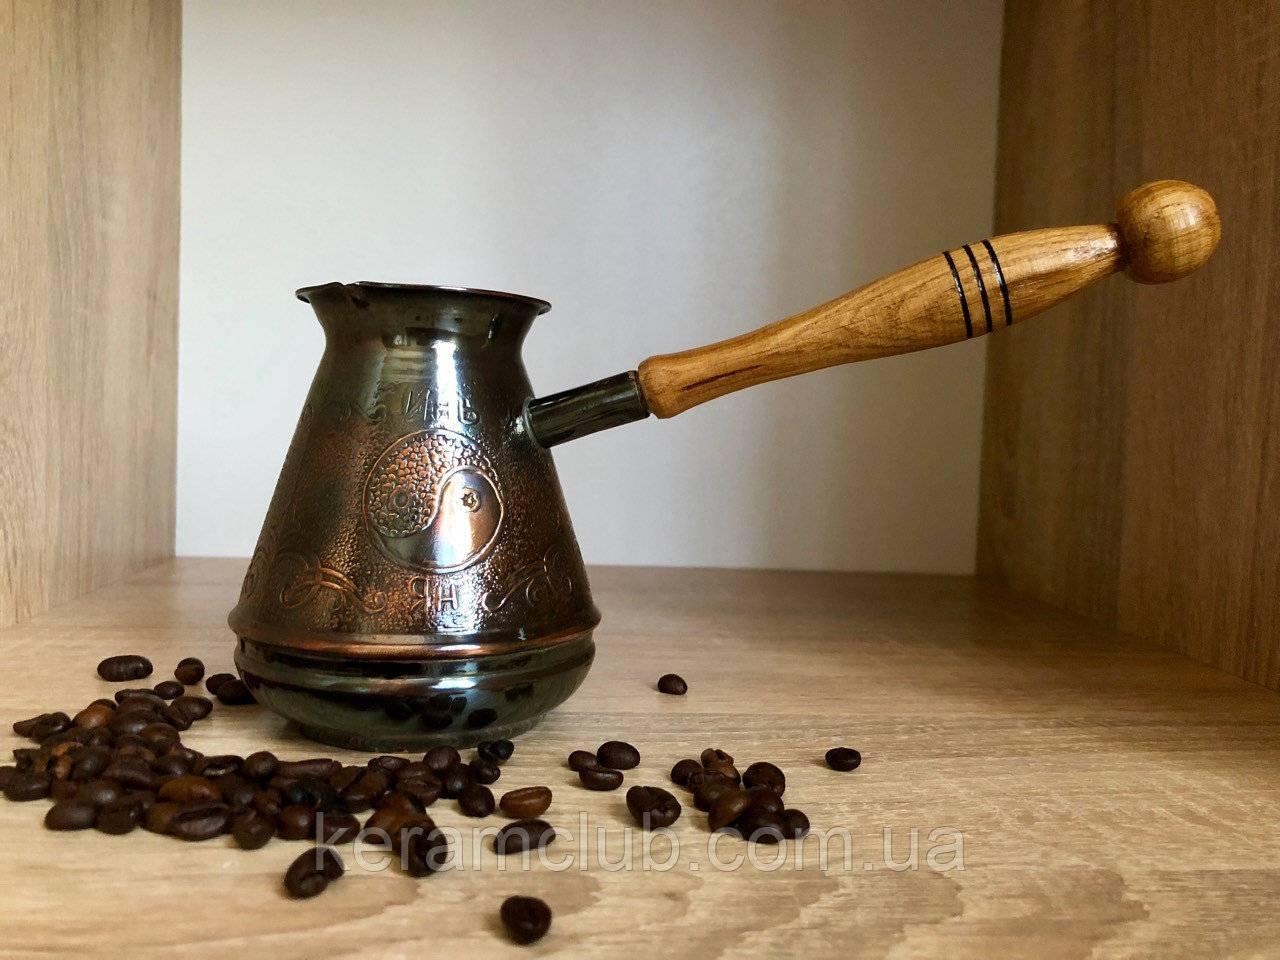 Турки для варки кофе